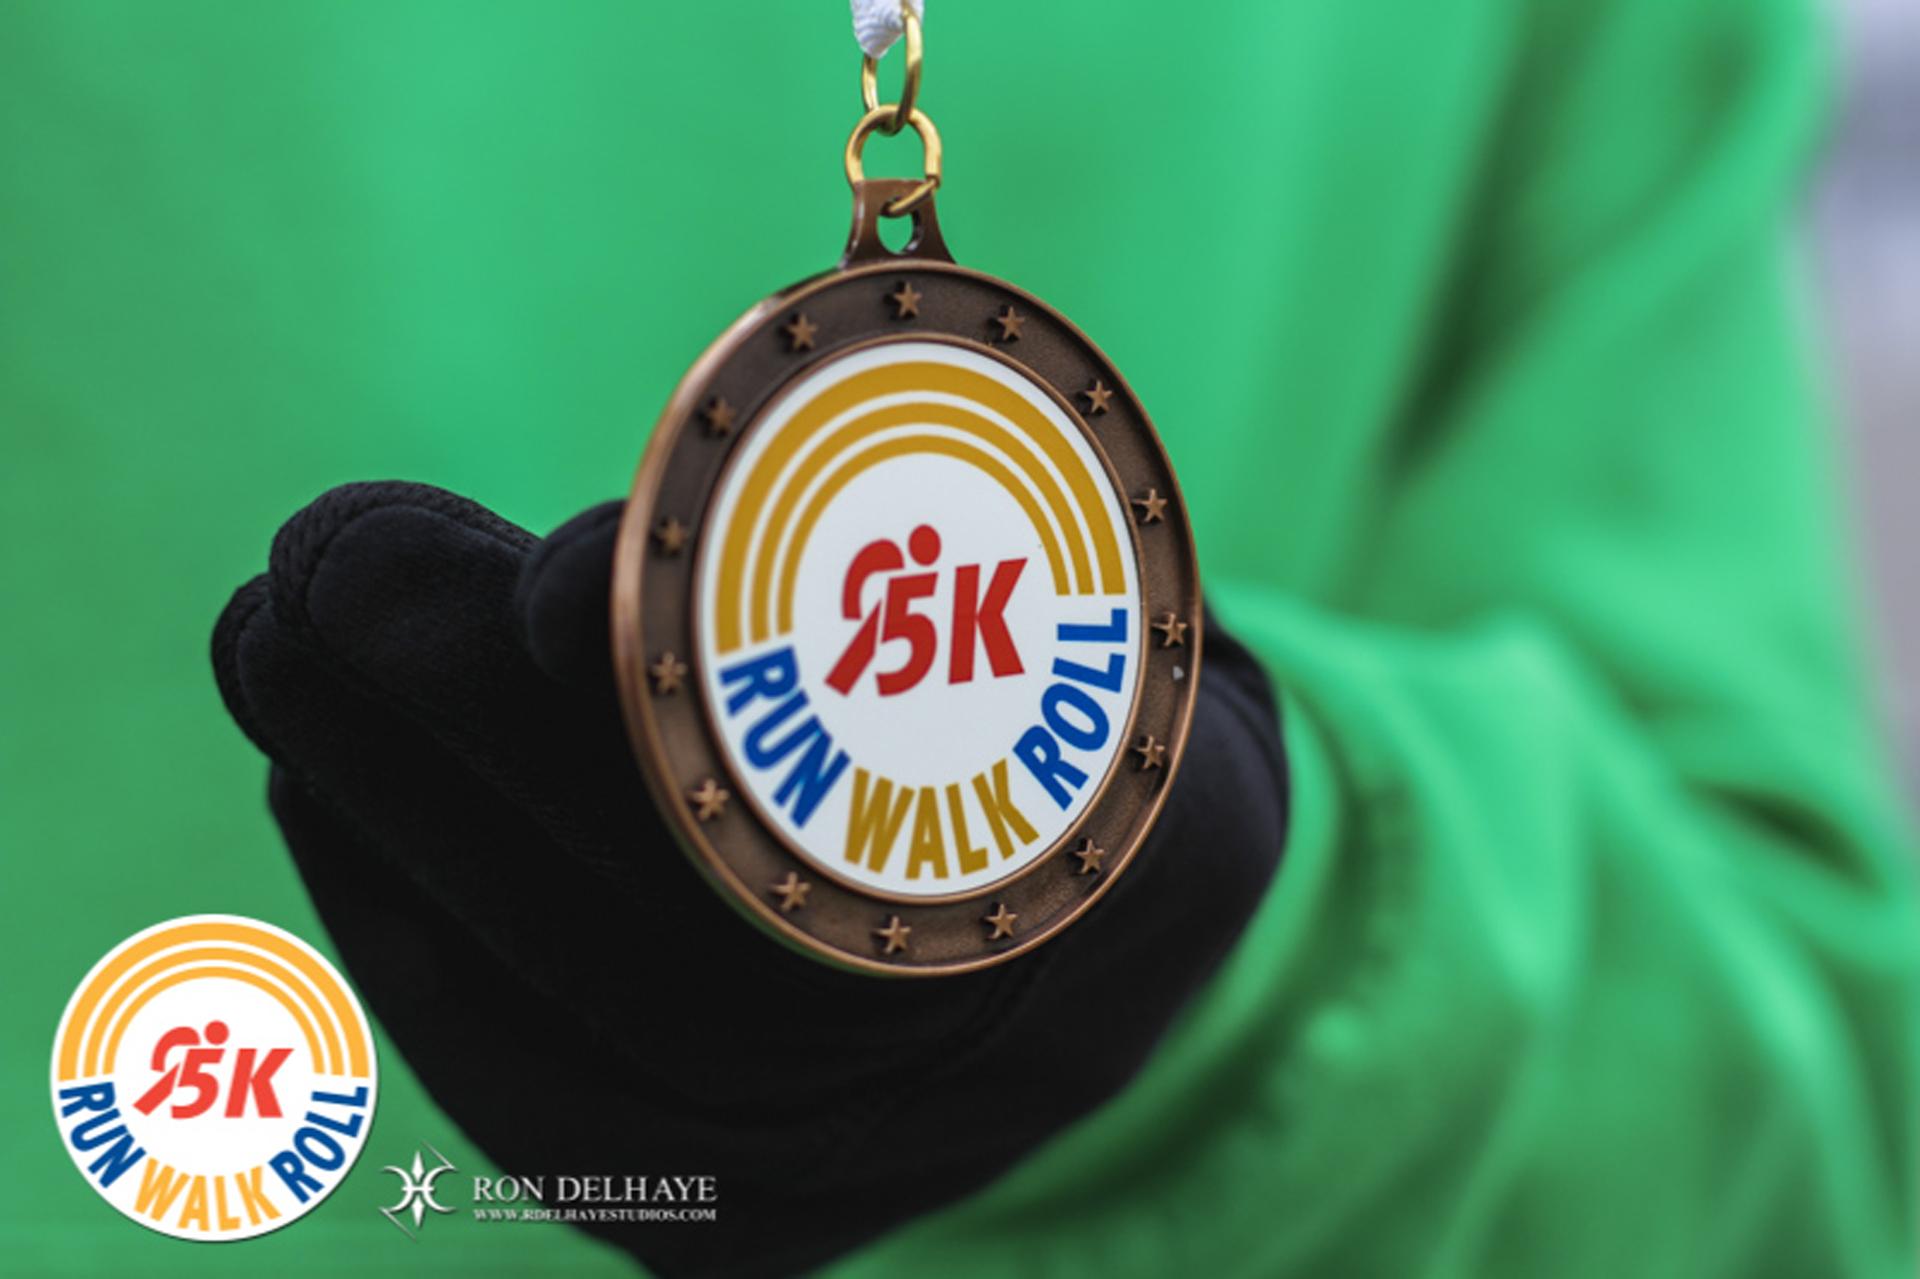 United Way 5K Run, Walk, Roll medal